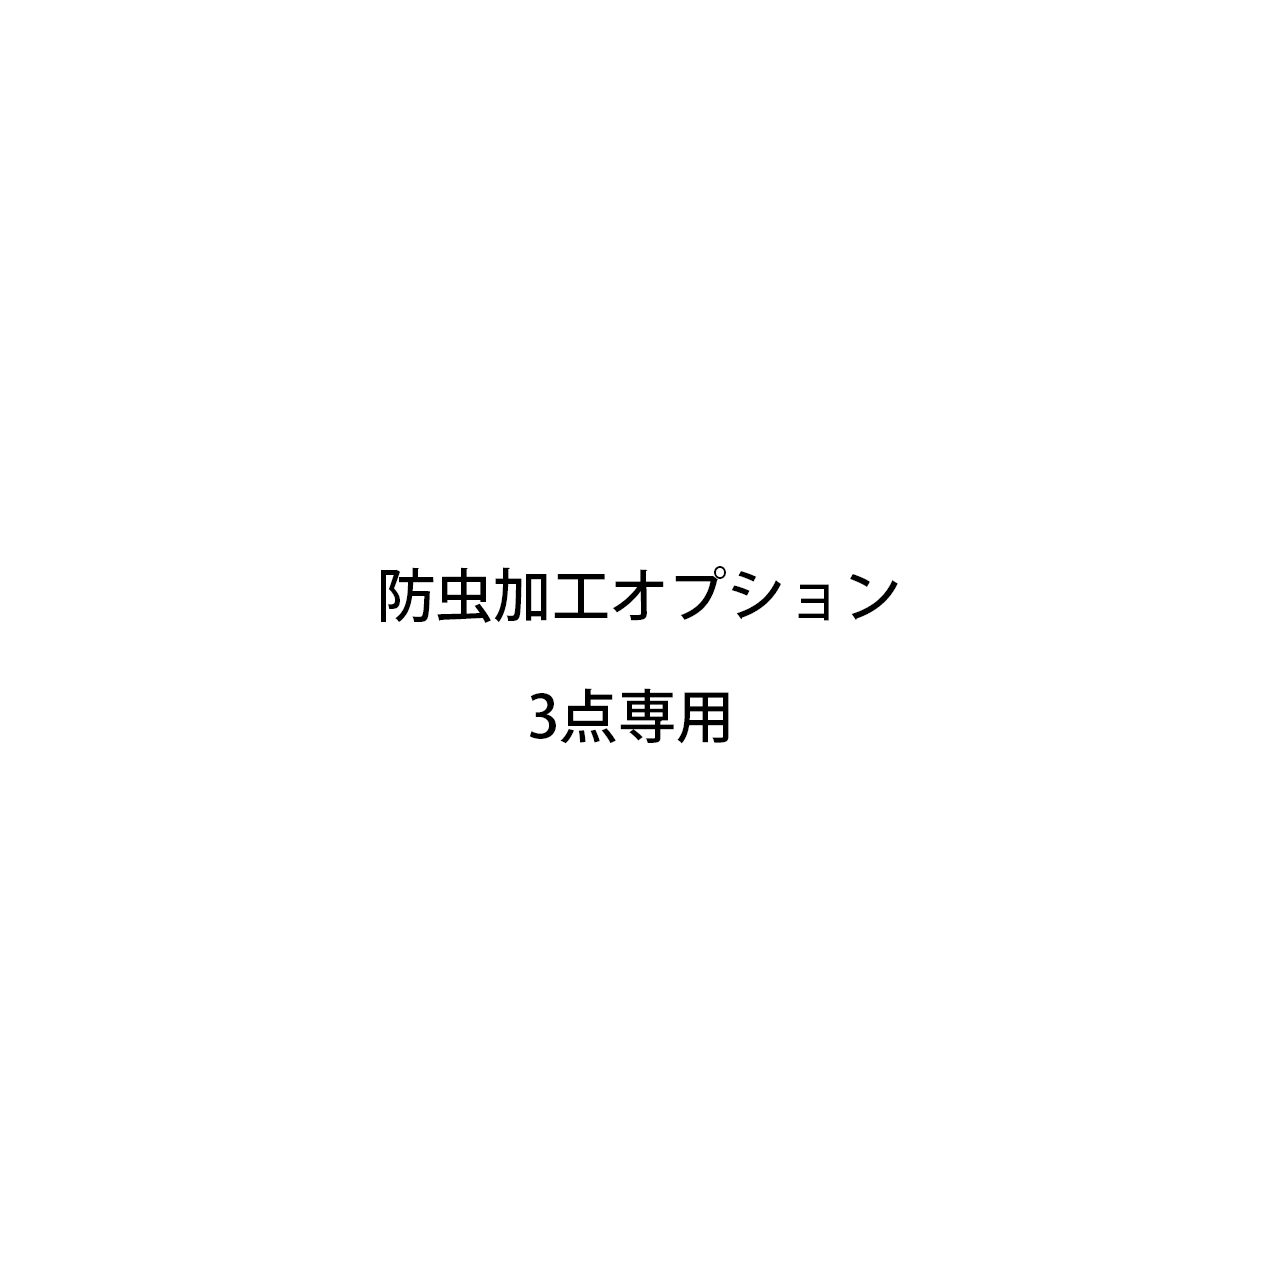 〔CARE MAINTENANCE_3 専用オプション〕防虫加工3点